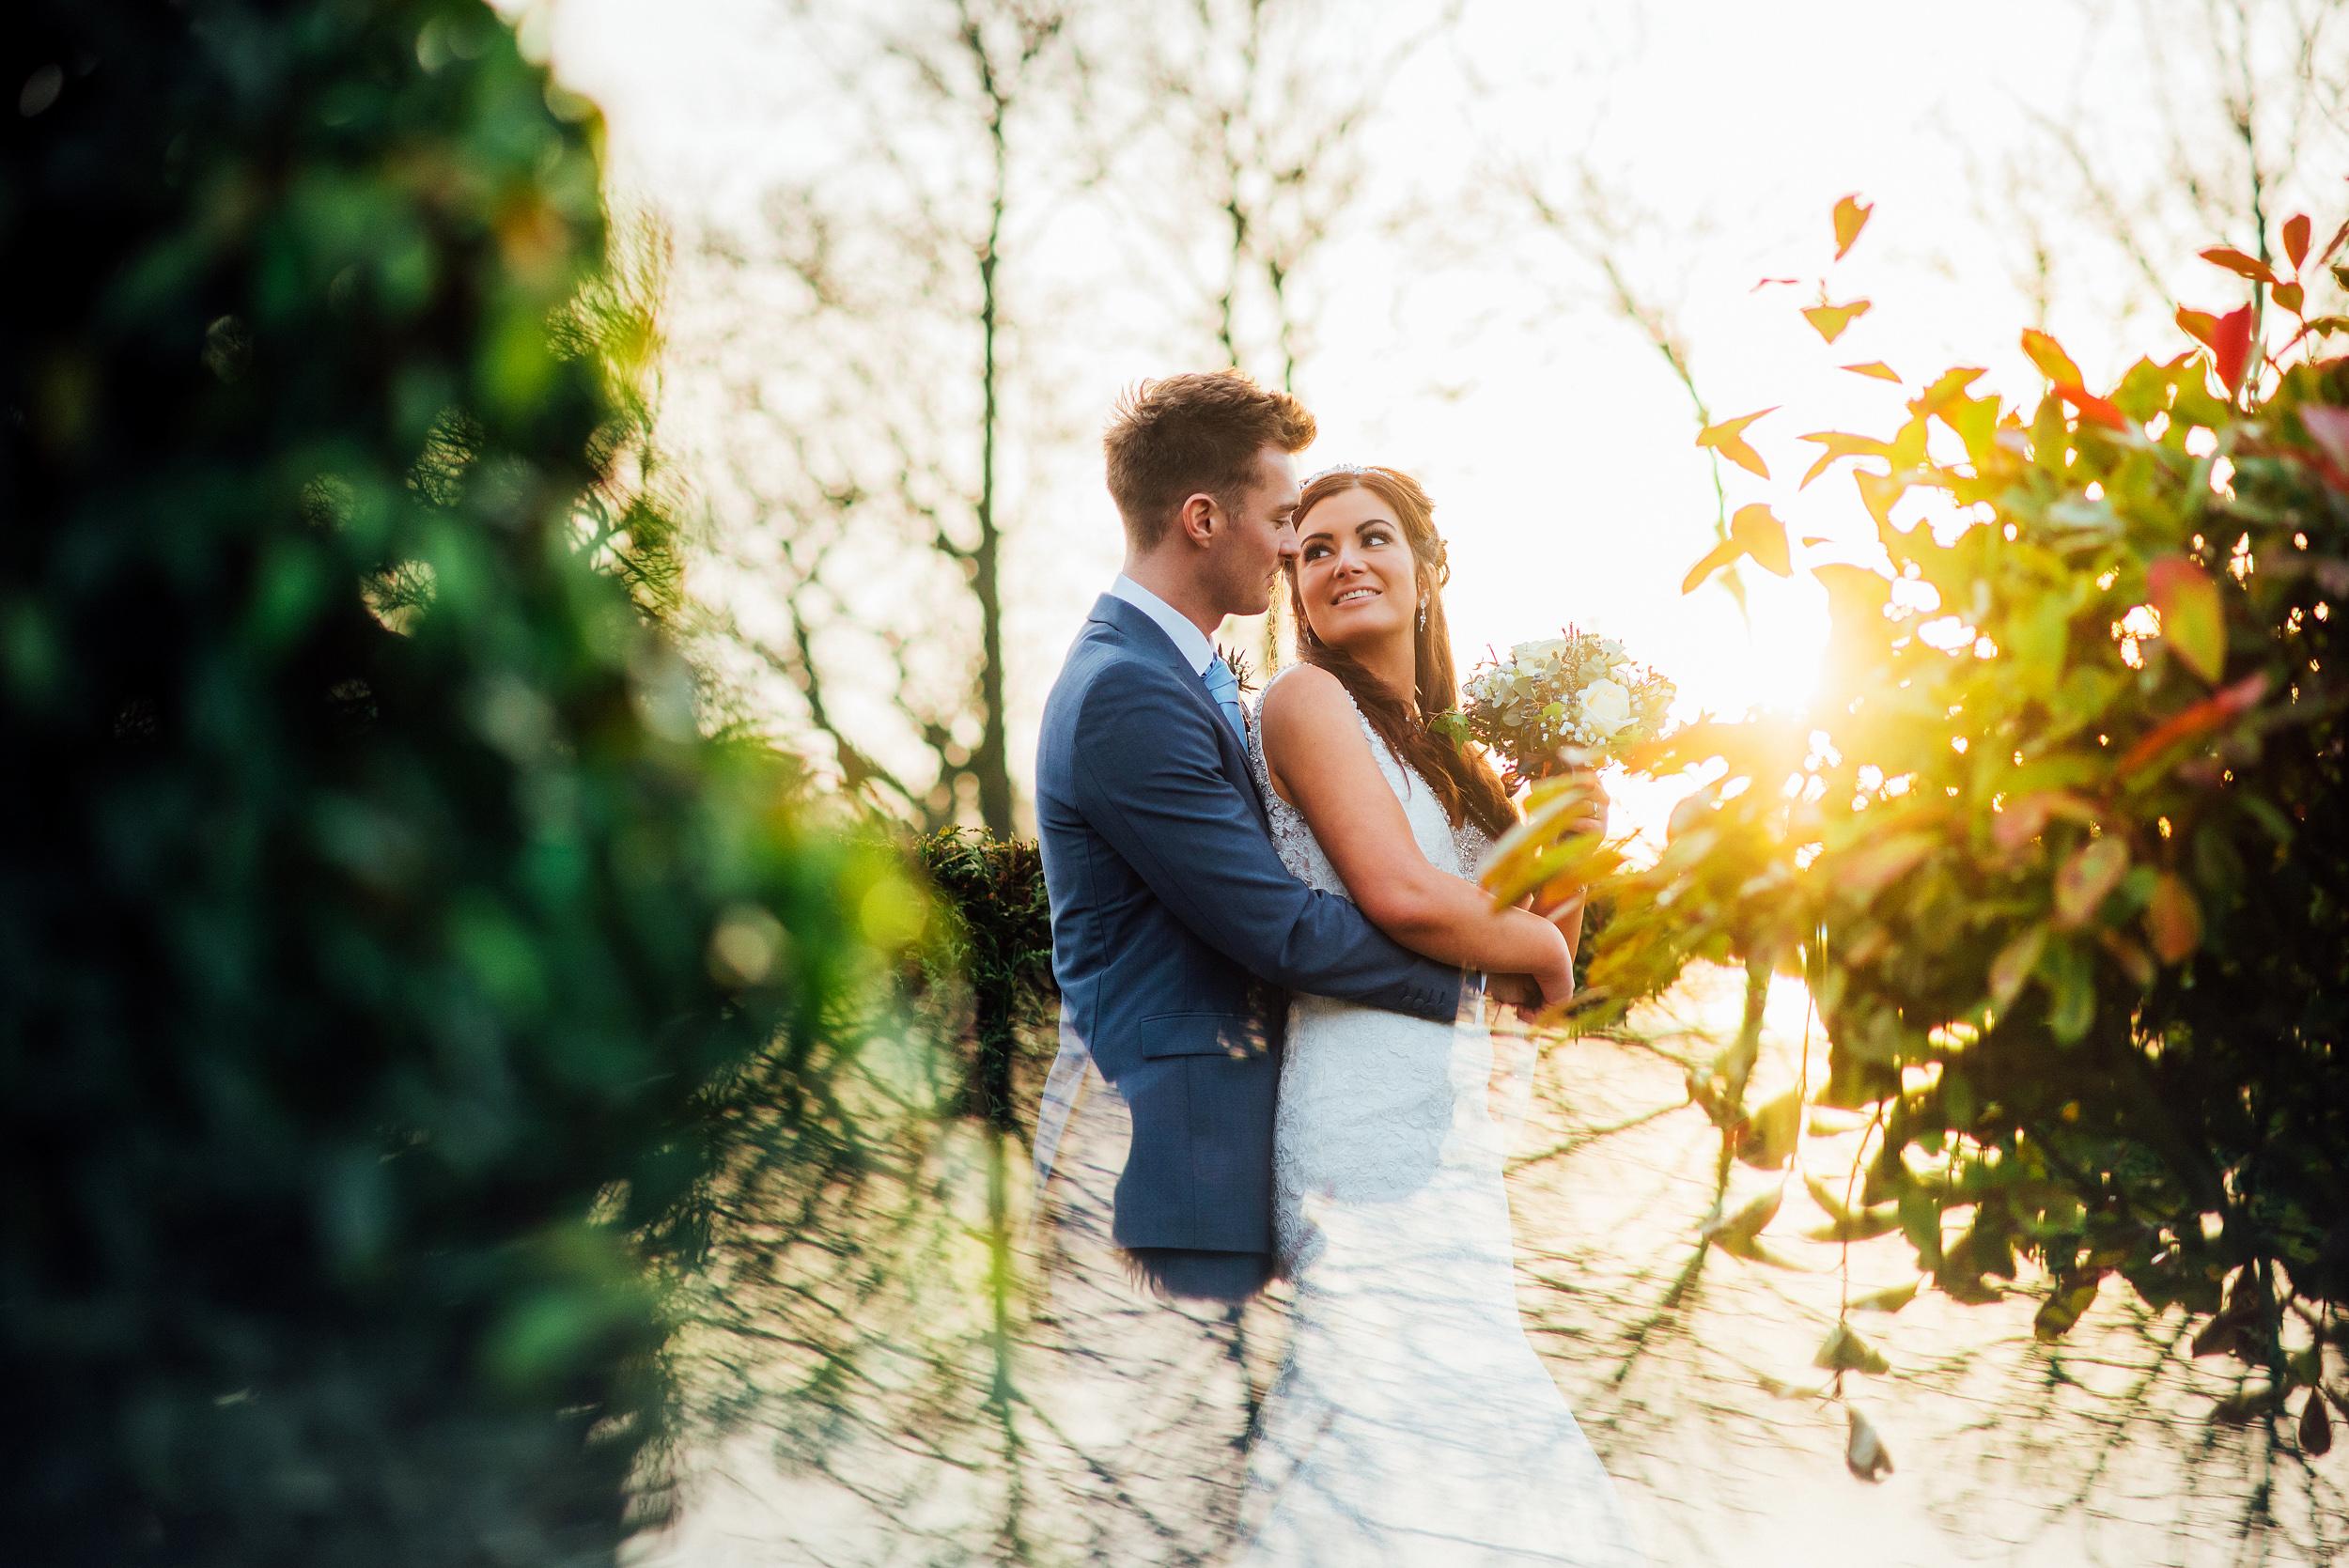 David Scholes Lancashire wedding photography 2016-11.jpg